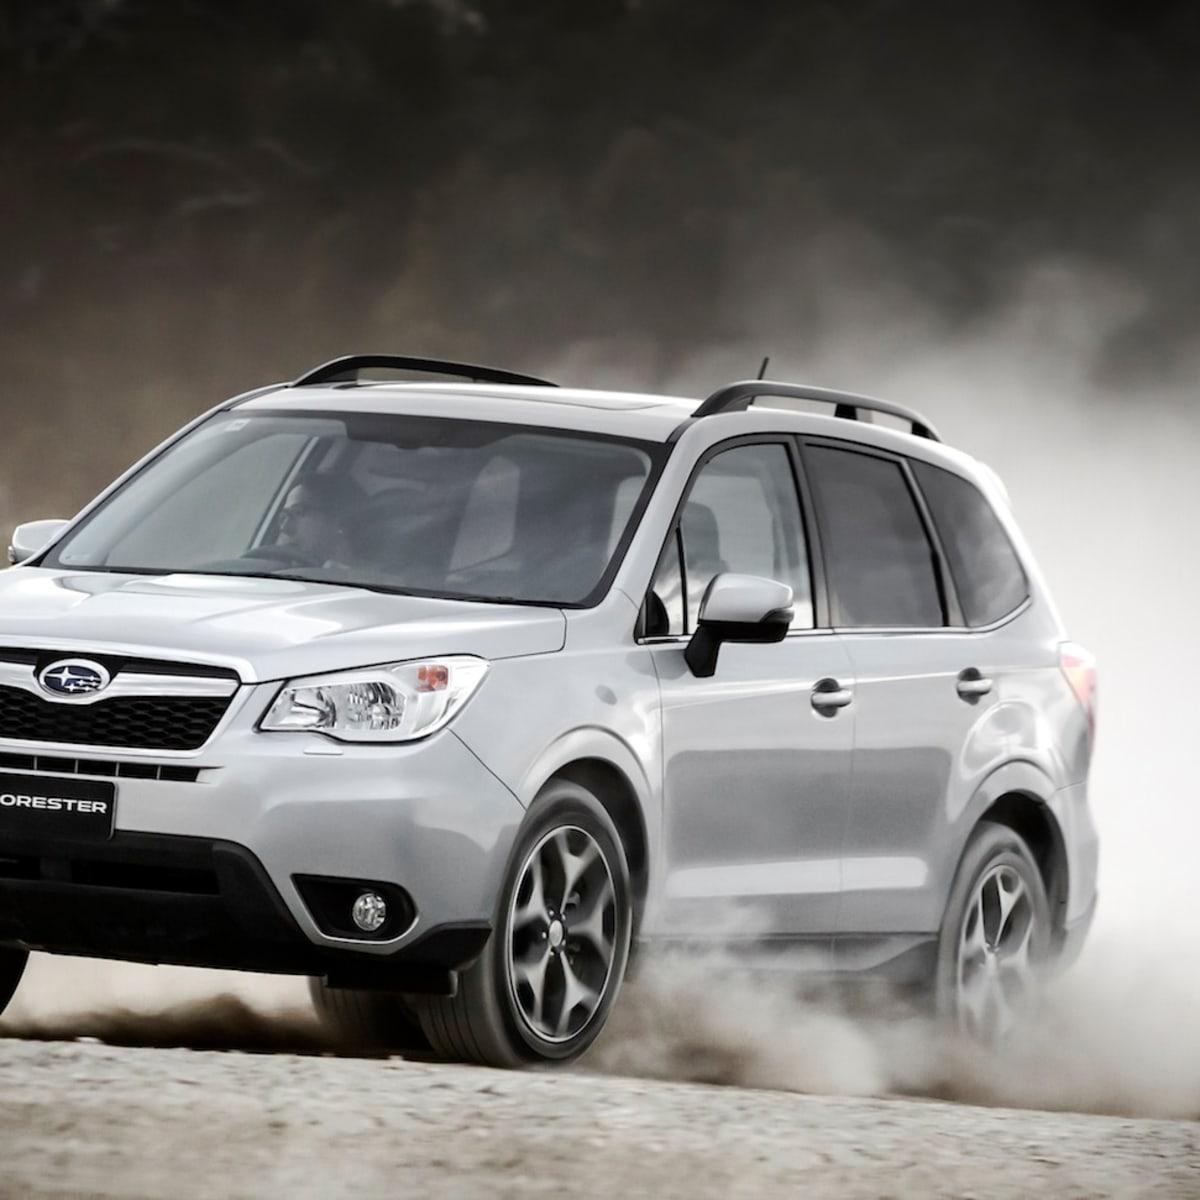 2013 Subaru Forester Review | CarAdvice